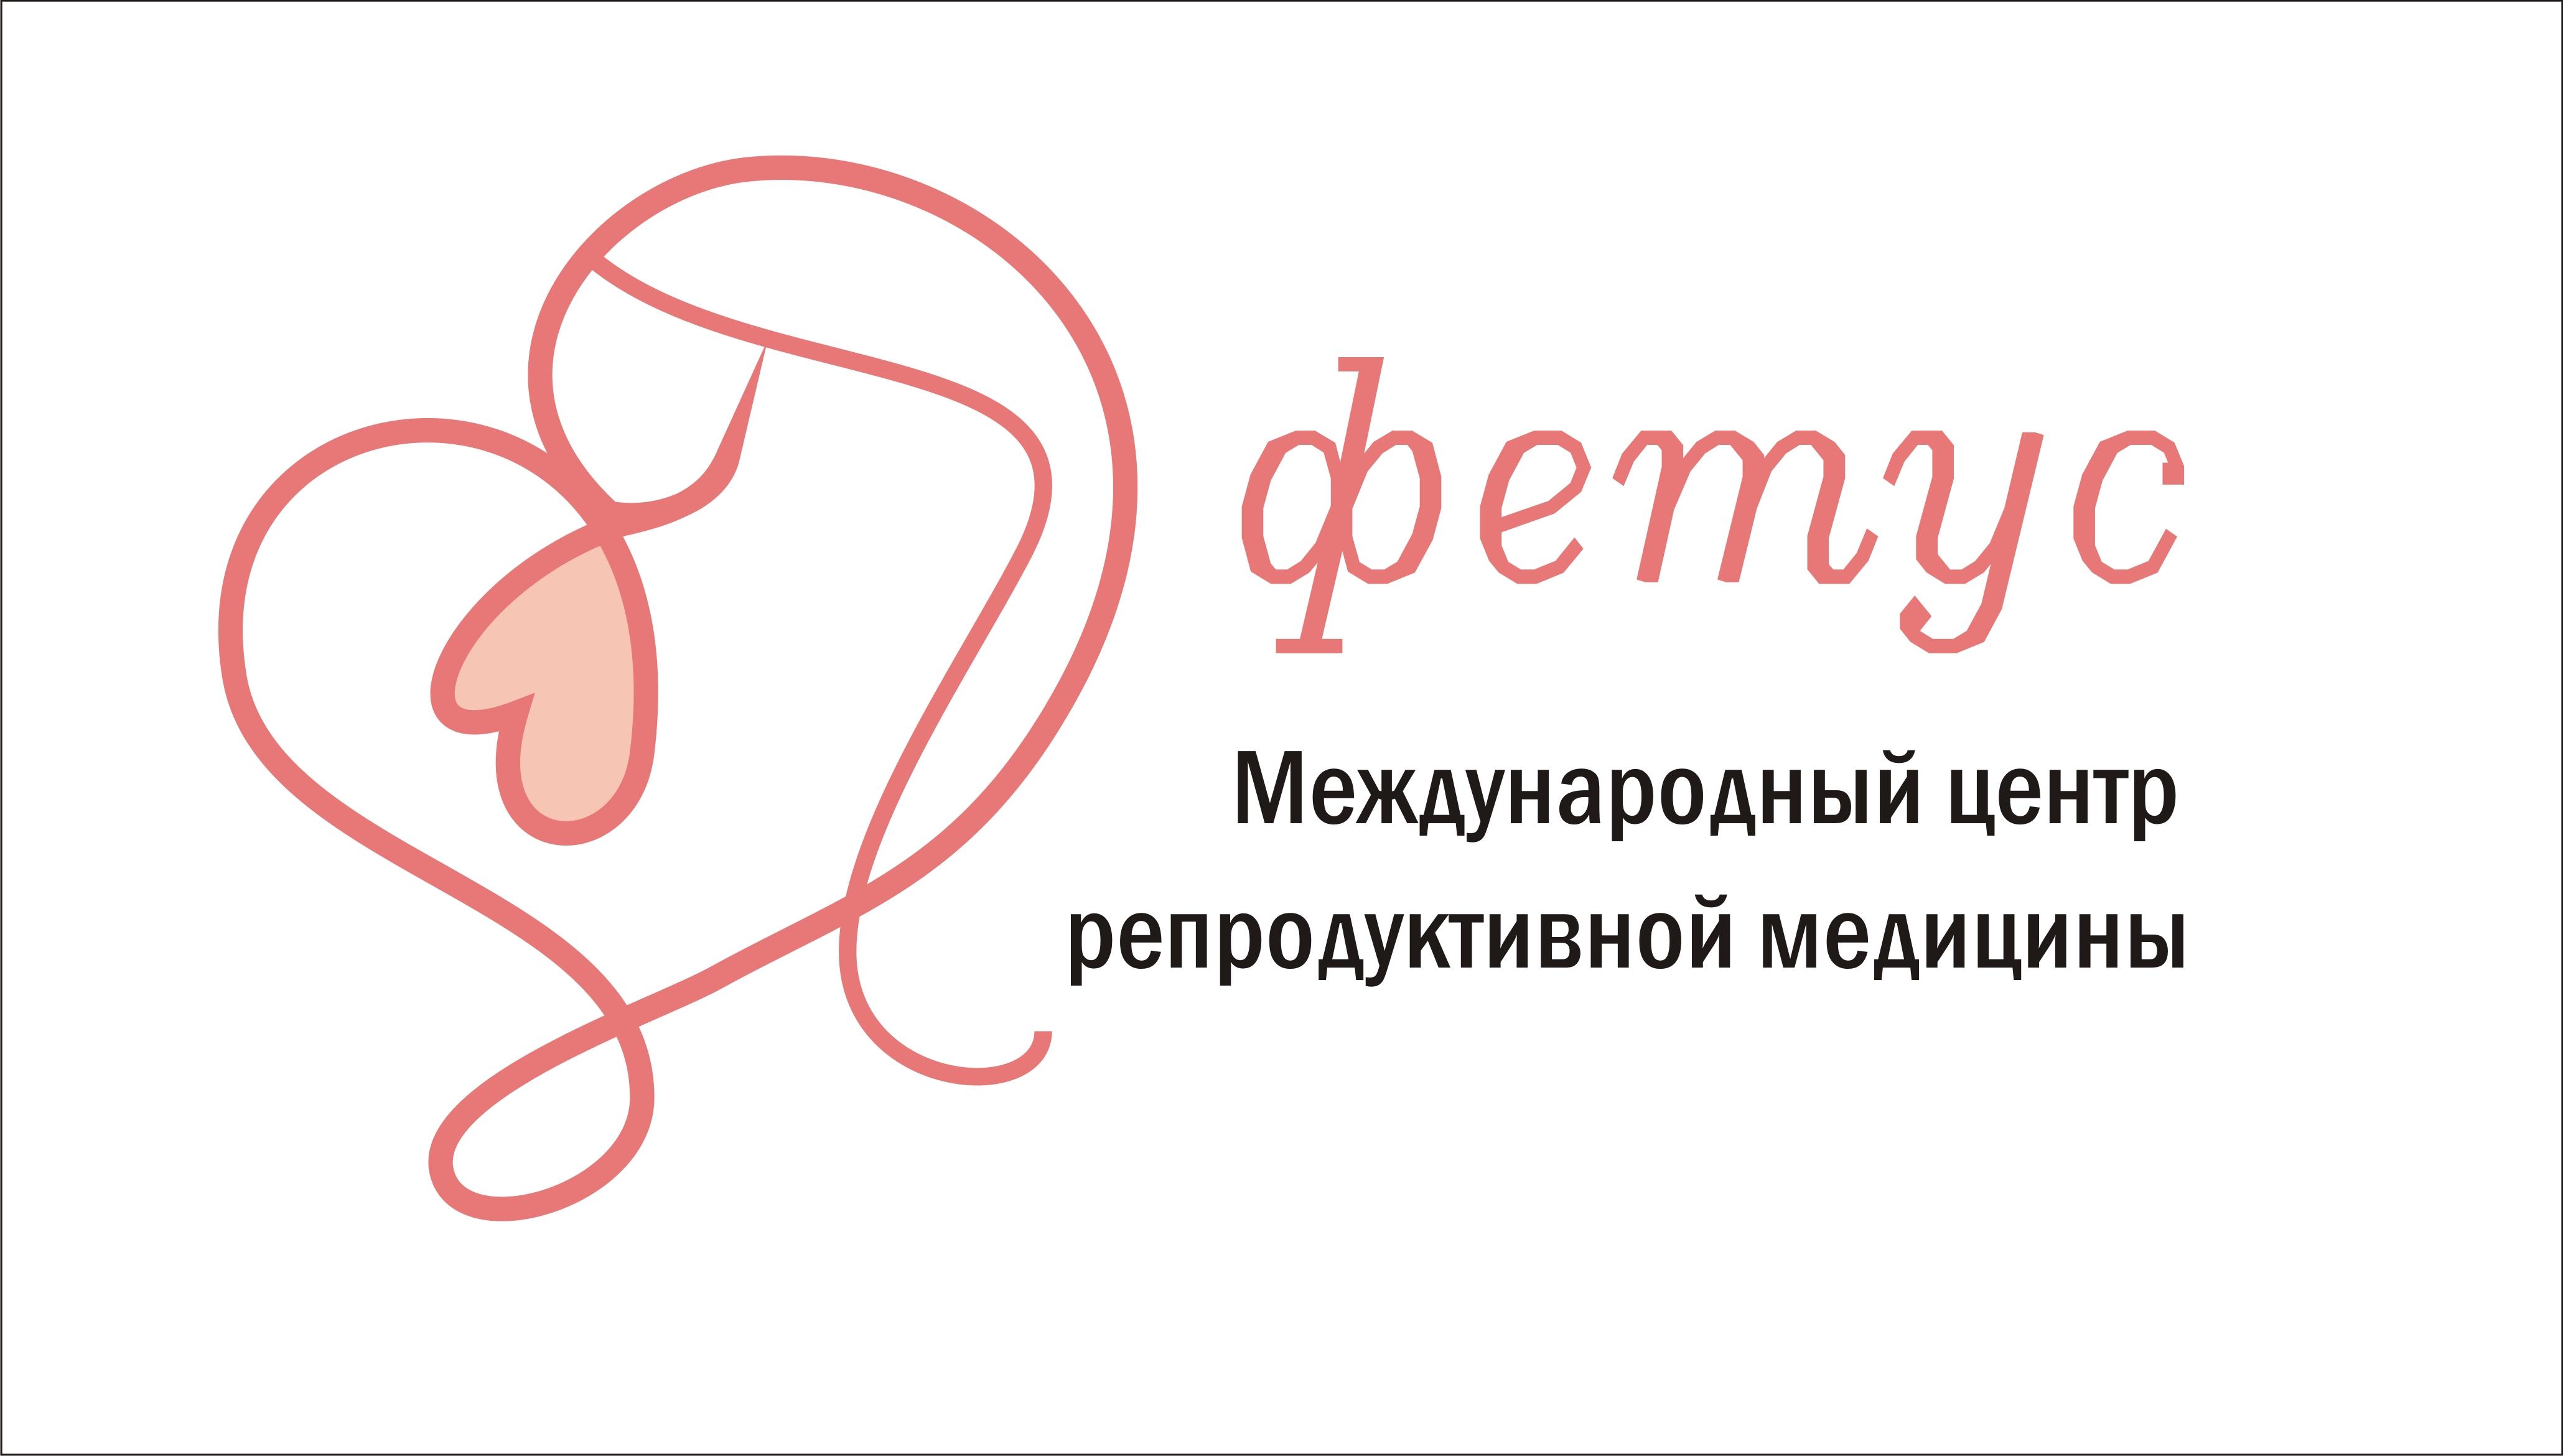 Нейминг+Логотип фото f_21758fba083a4bd3.jpg